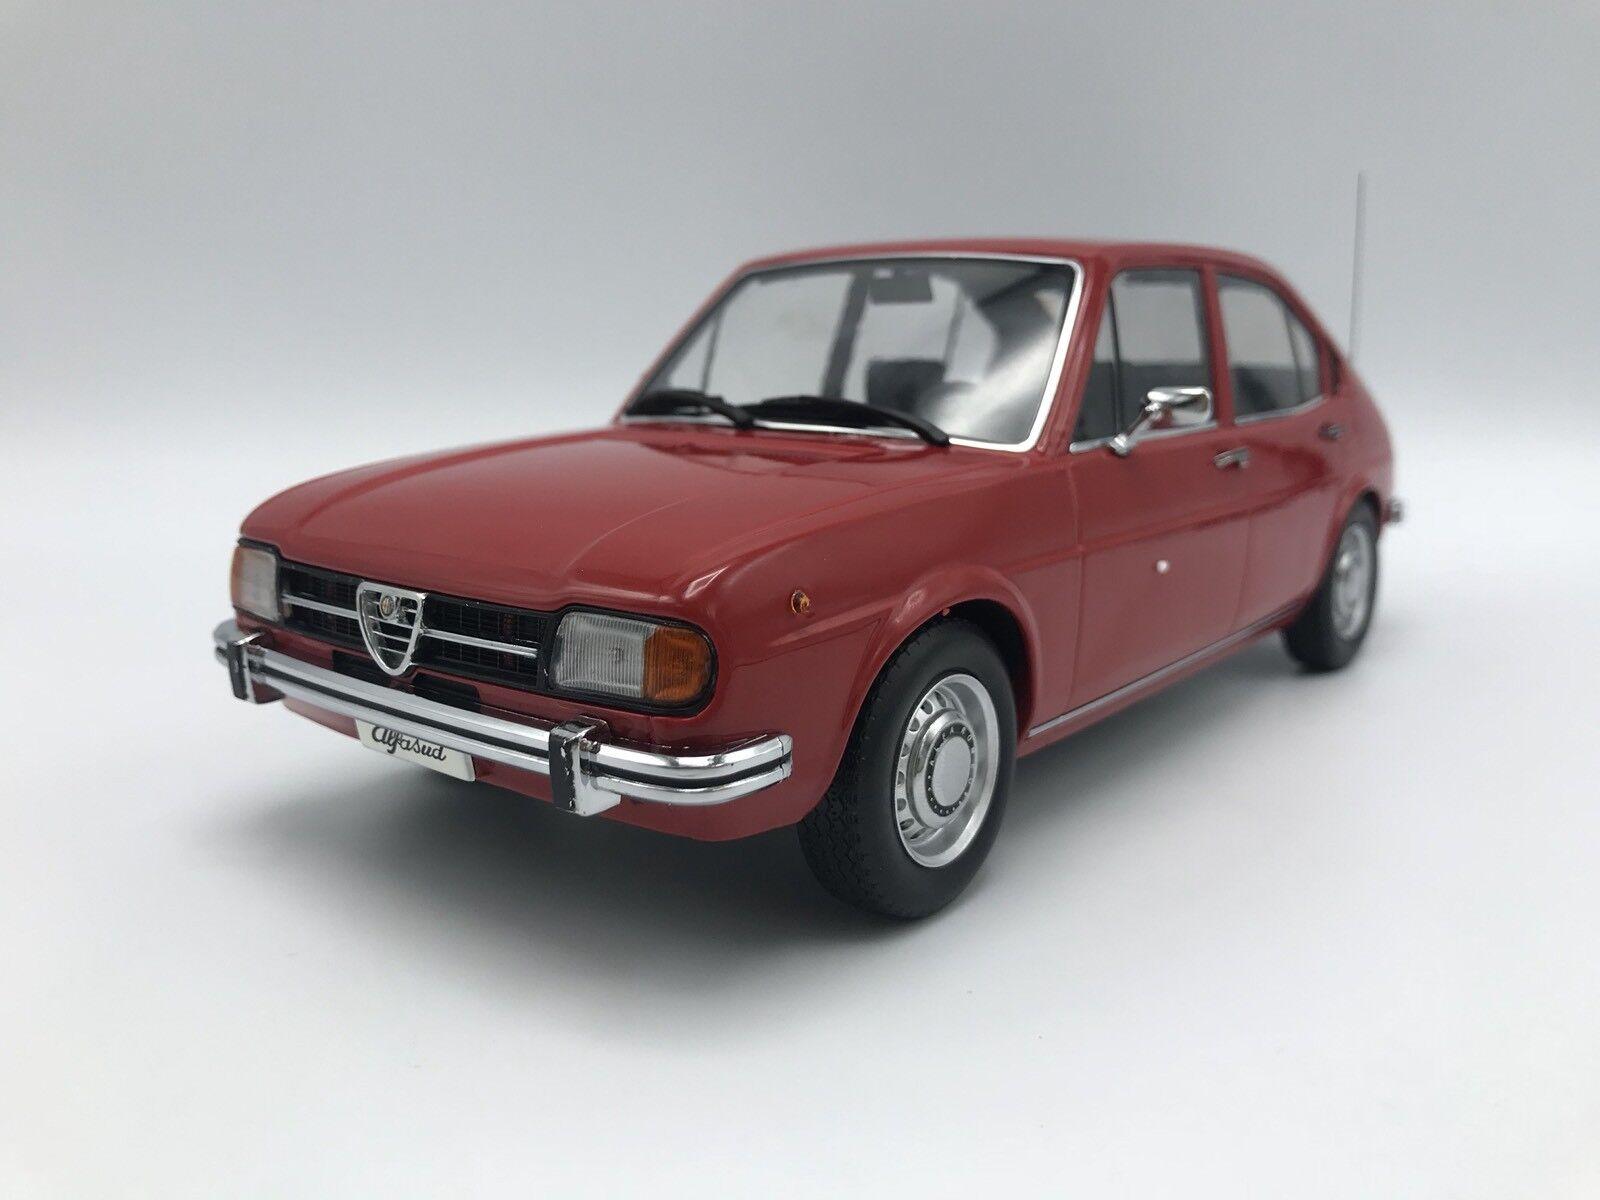 Noël, envoie de la joie Alfa Romeo Alfasud Alfasud Alfasud 1974-Rouge 1:18 KK-Scale >> NEUF << | La Réputation D'abord  aac123